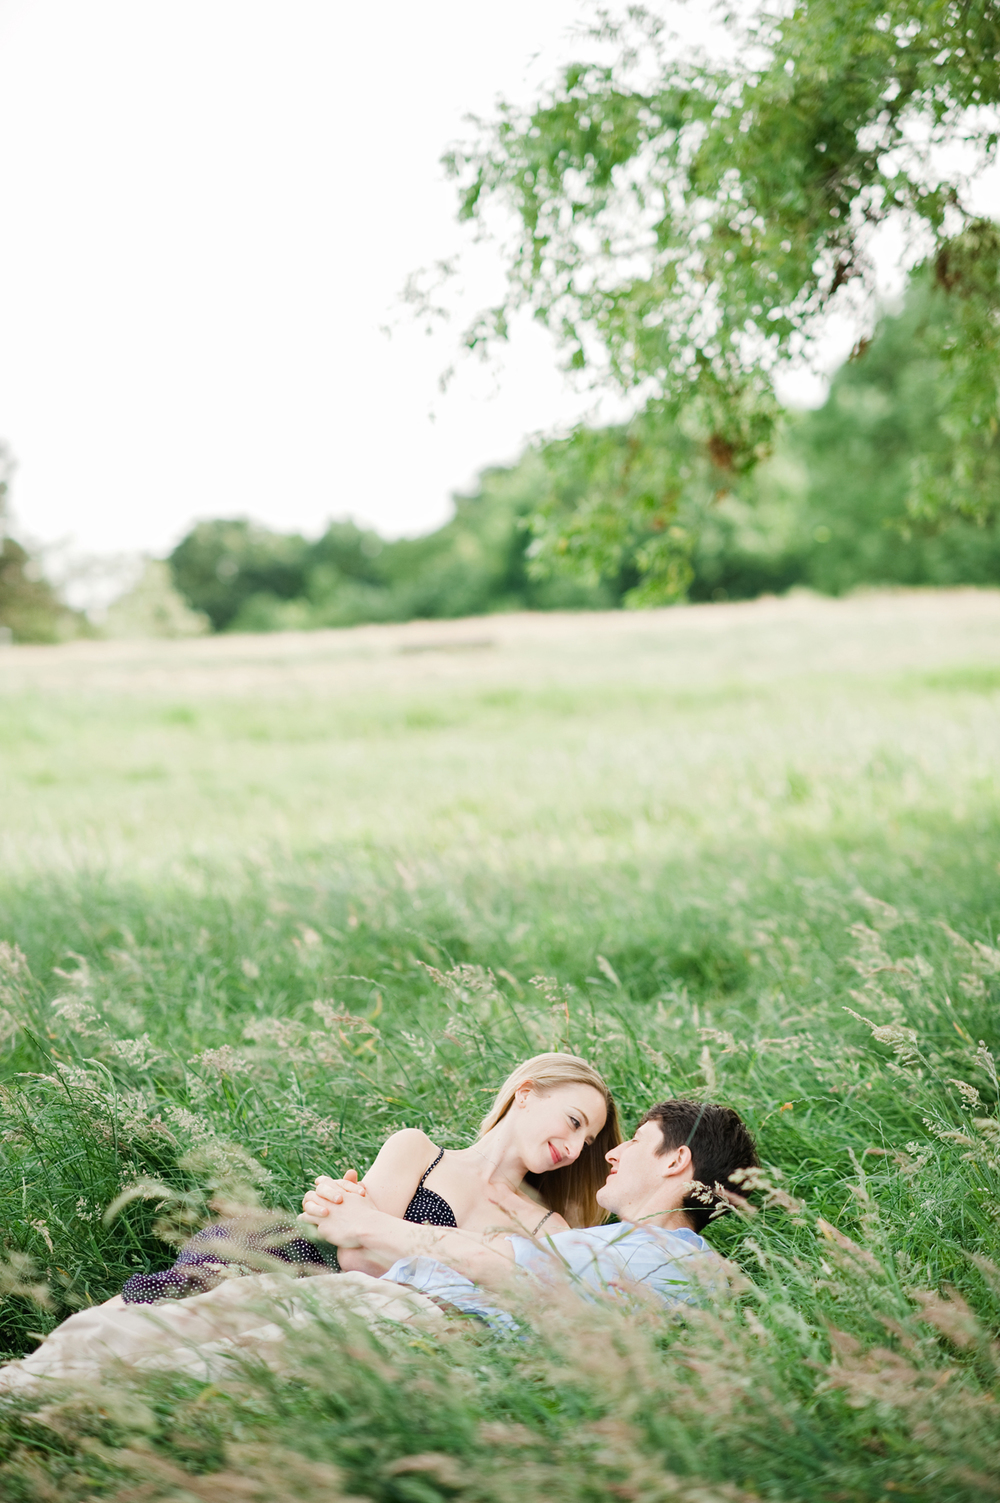 Couples-029.jpg